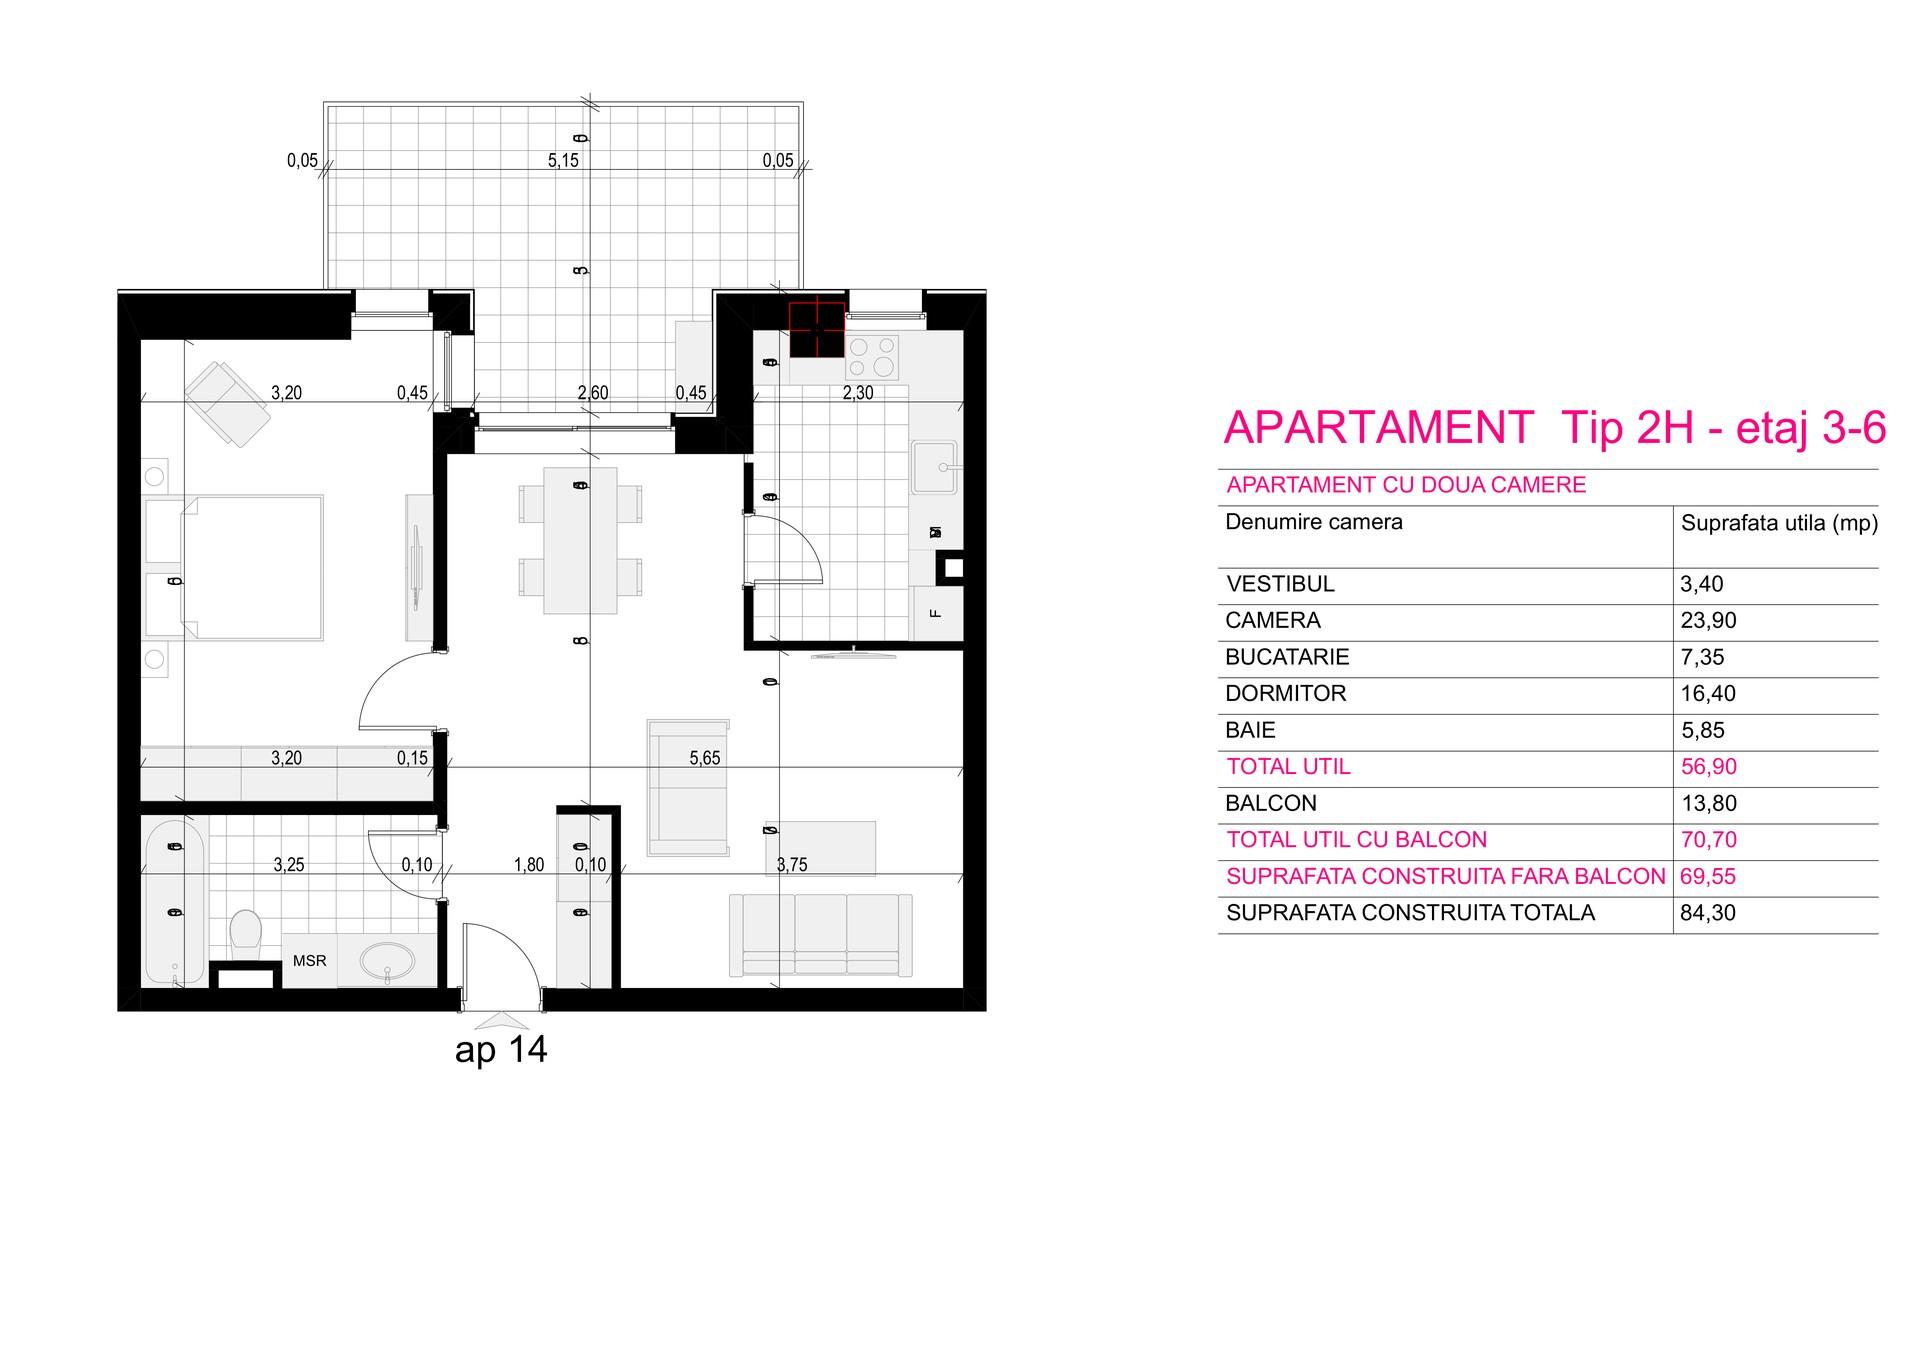 Ap Corp A Tip 2H etaj 3-6 - Aviatorii Residence